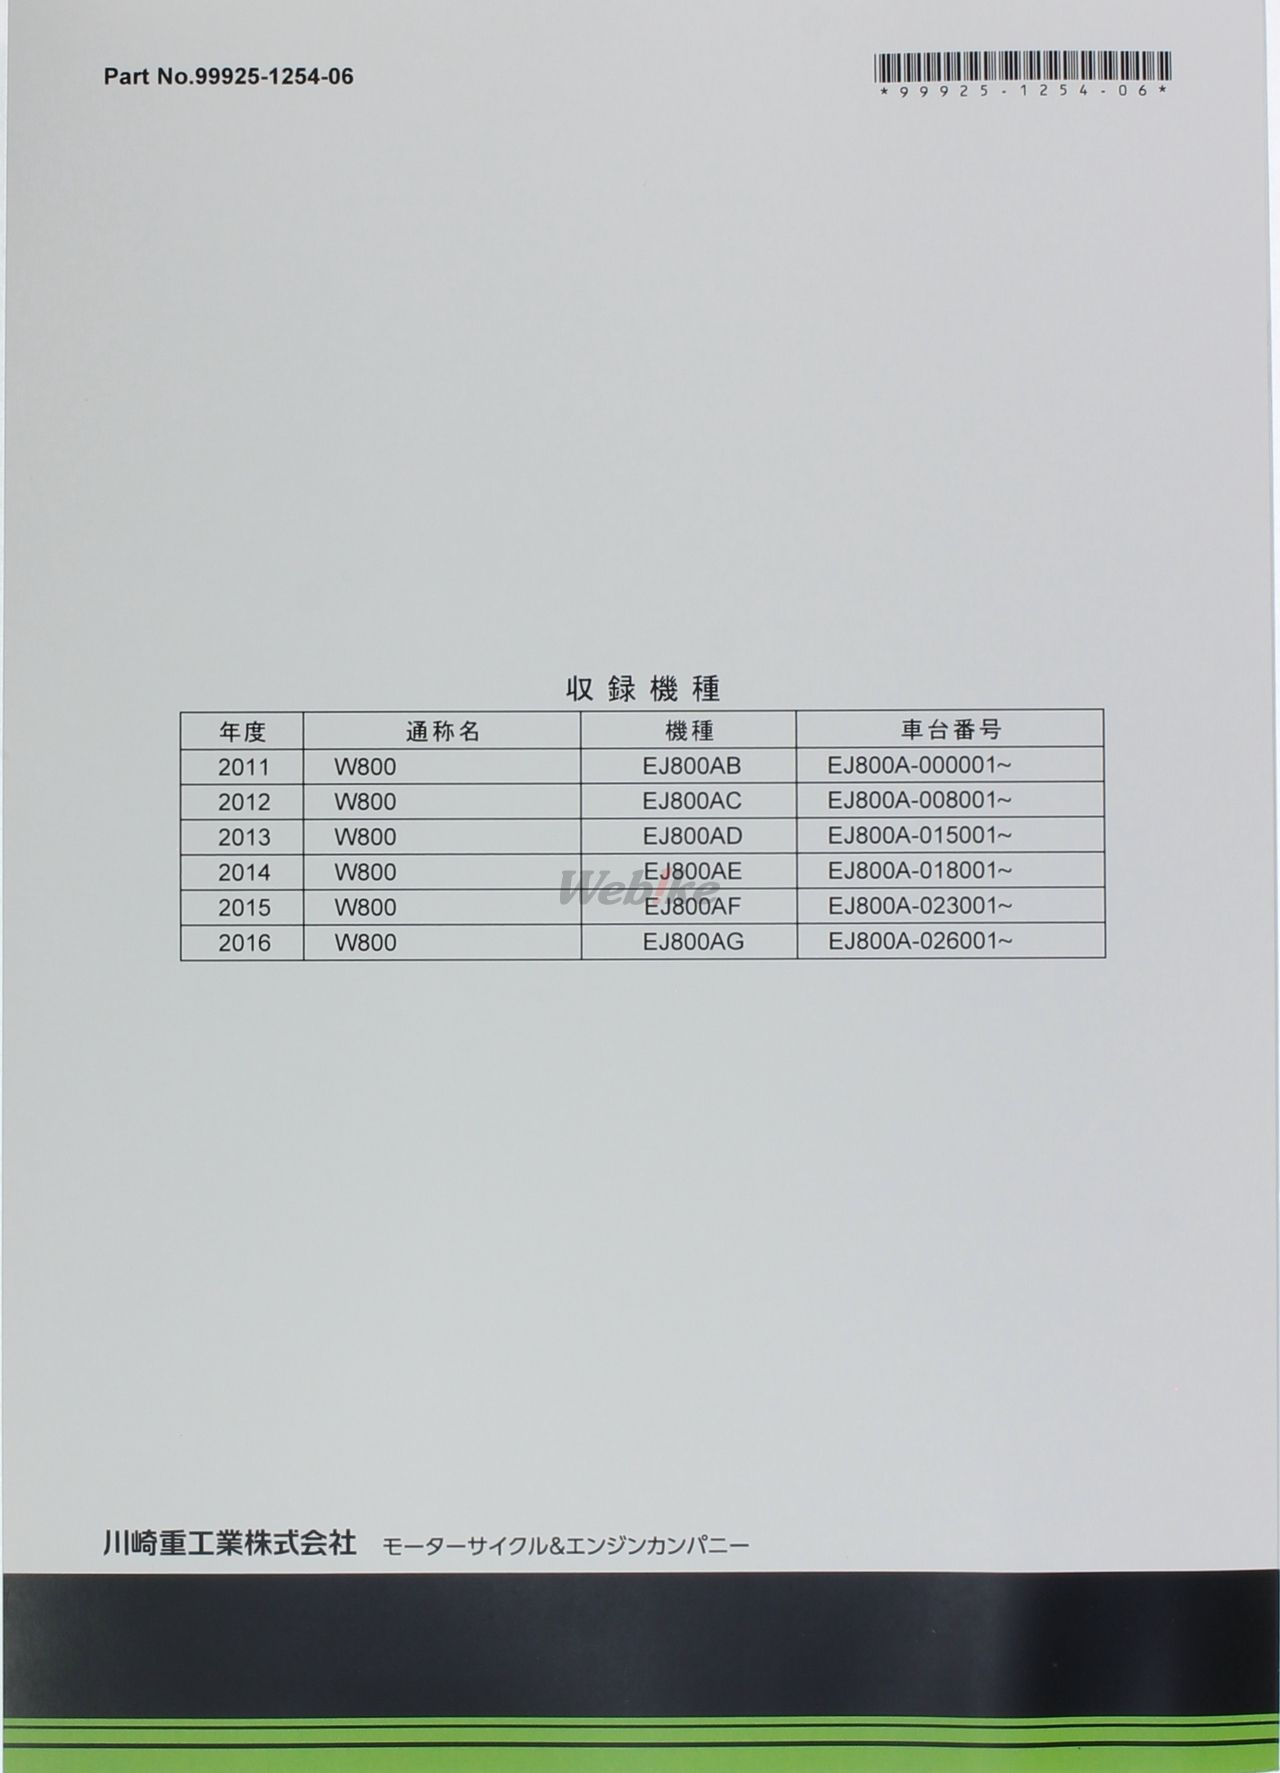 【KAWASAKI】W800 維修手冊(基本版) - 「Webike-摩托百貨」